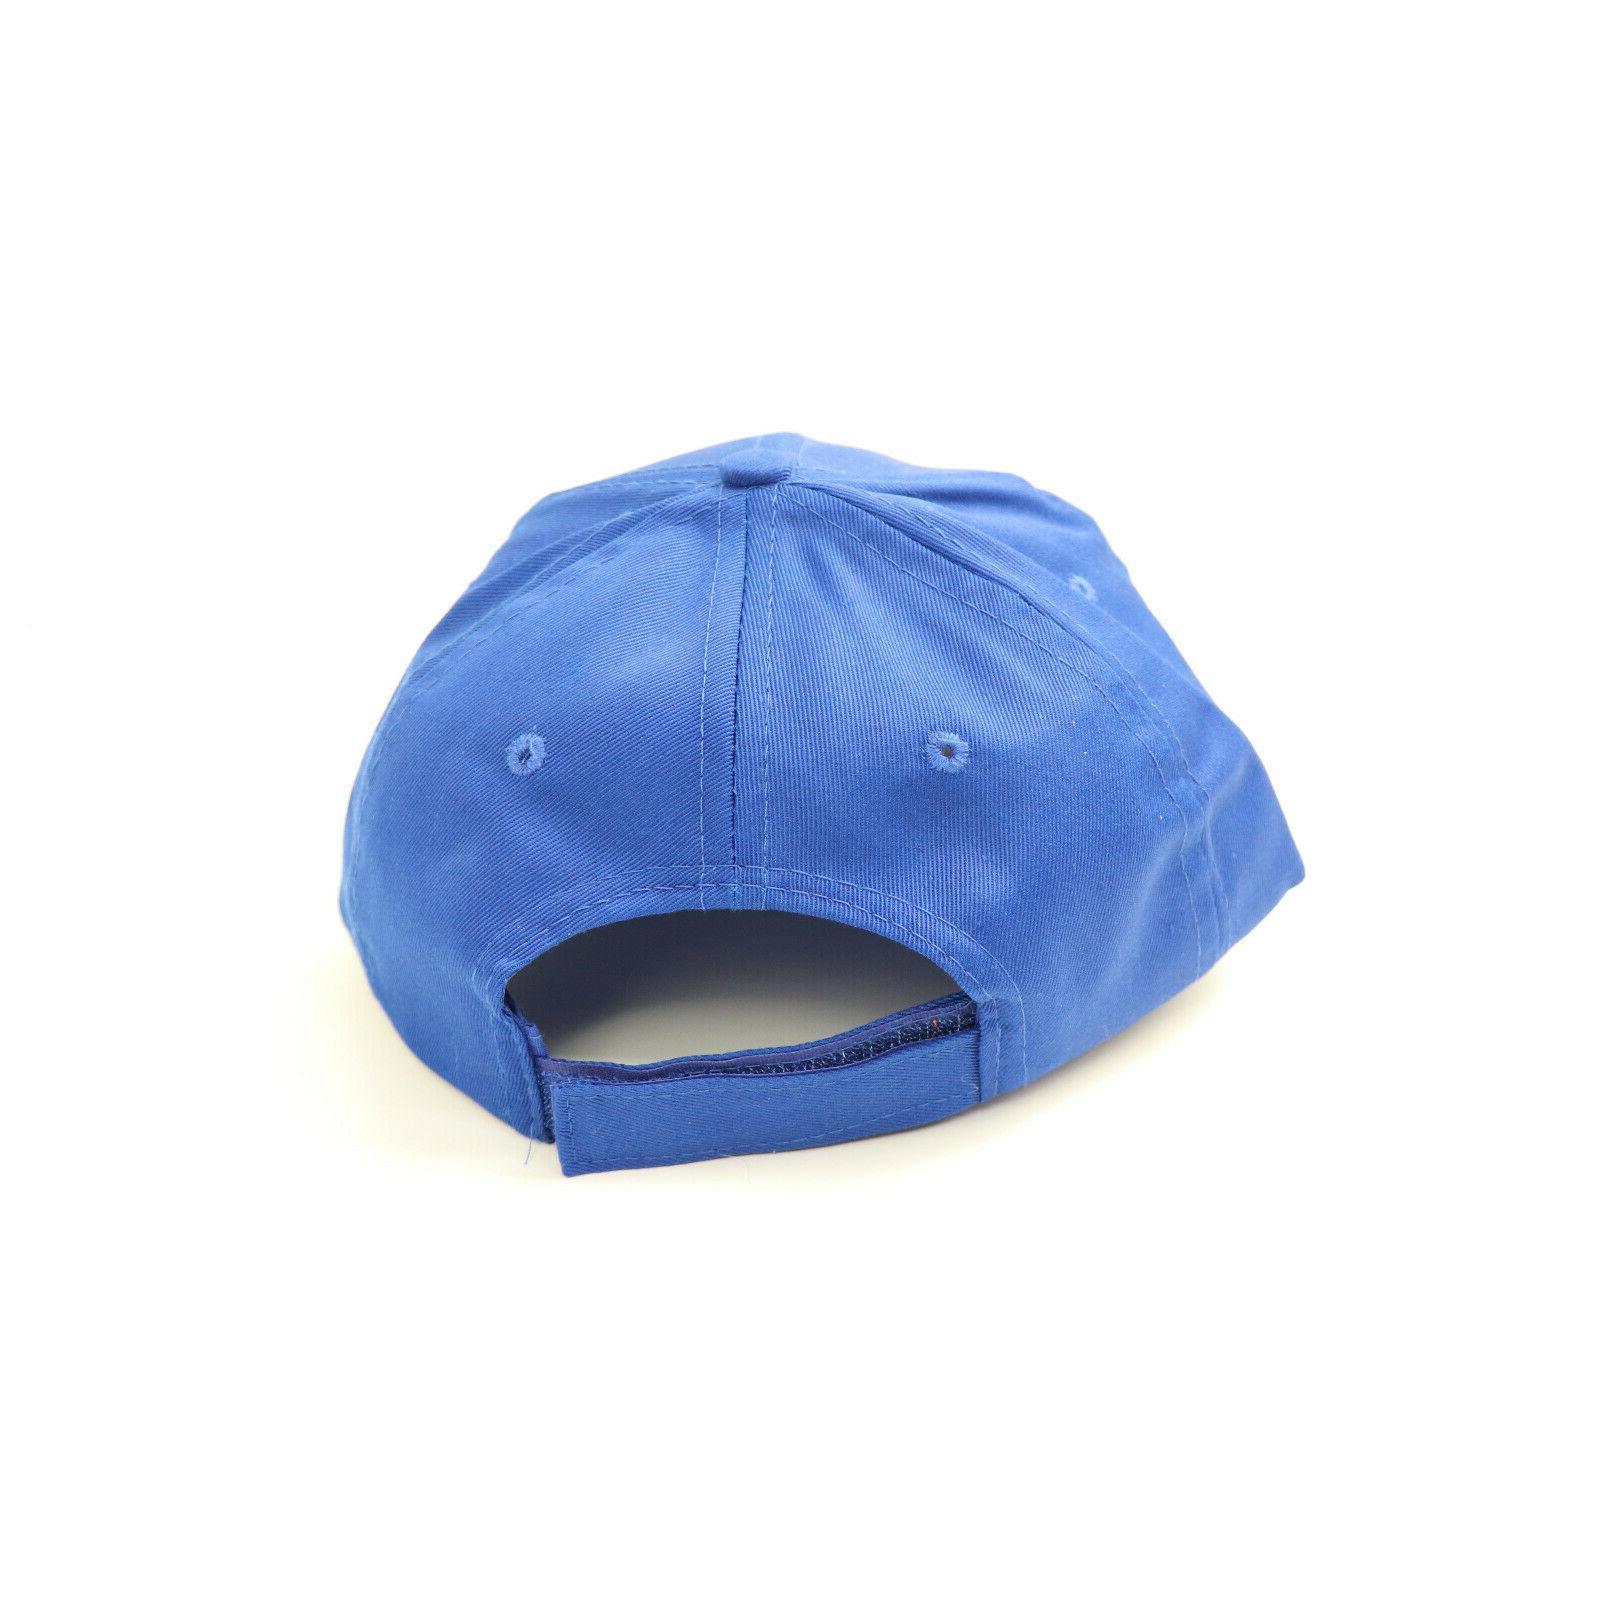 Bud Light Baseball Cap Hat Blue Strap